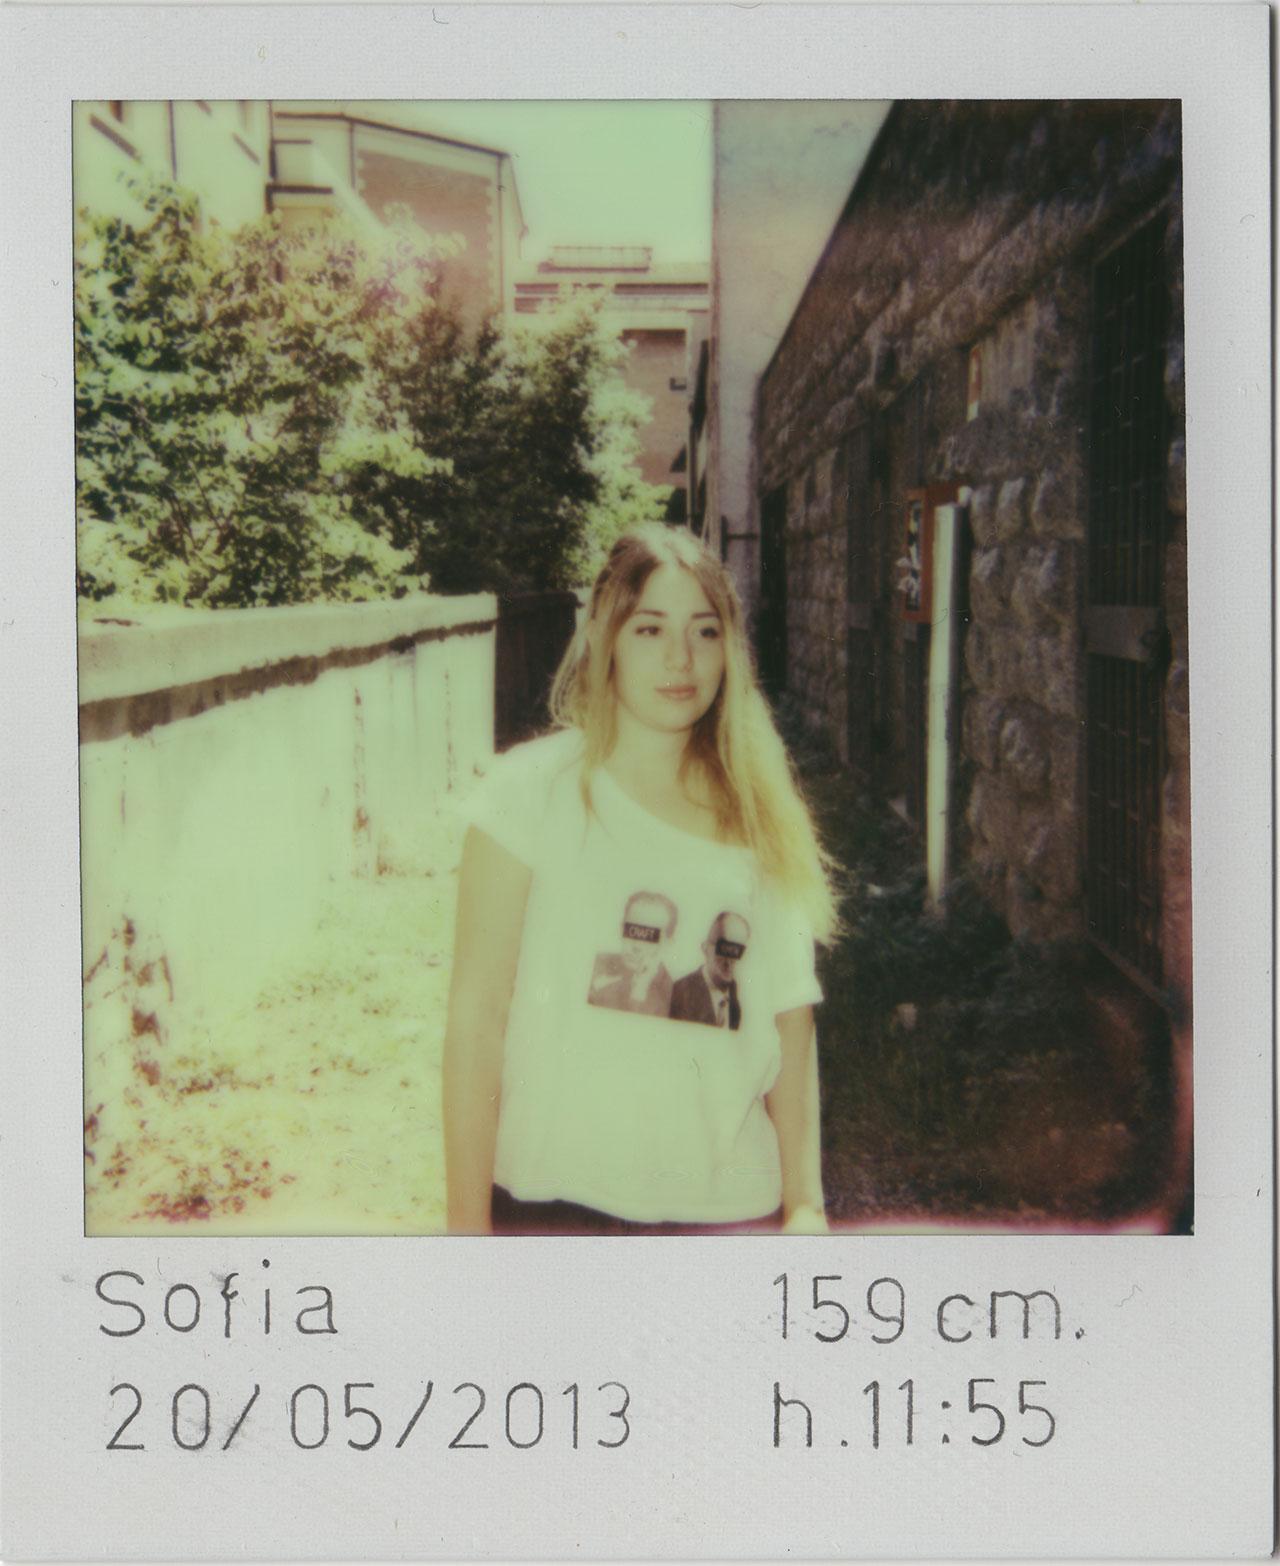 Irene Fenara, Ho preso le distanze, 2013. 33 Polaroid, Courtesy Irene Fenara.